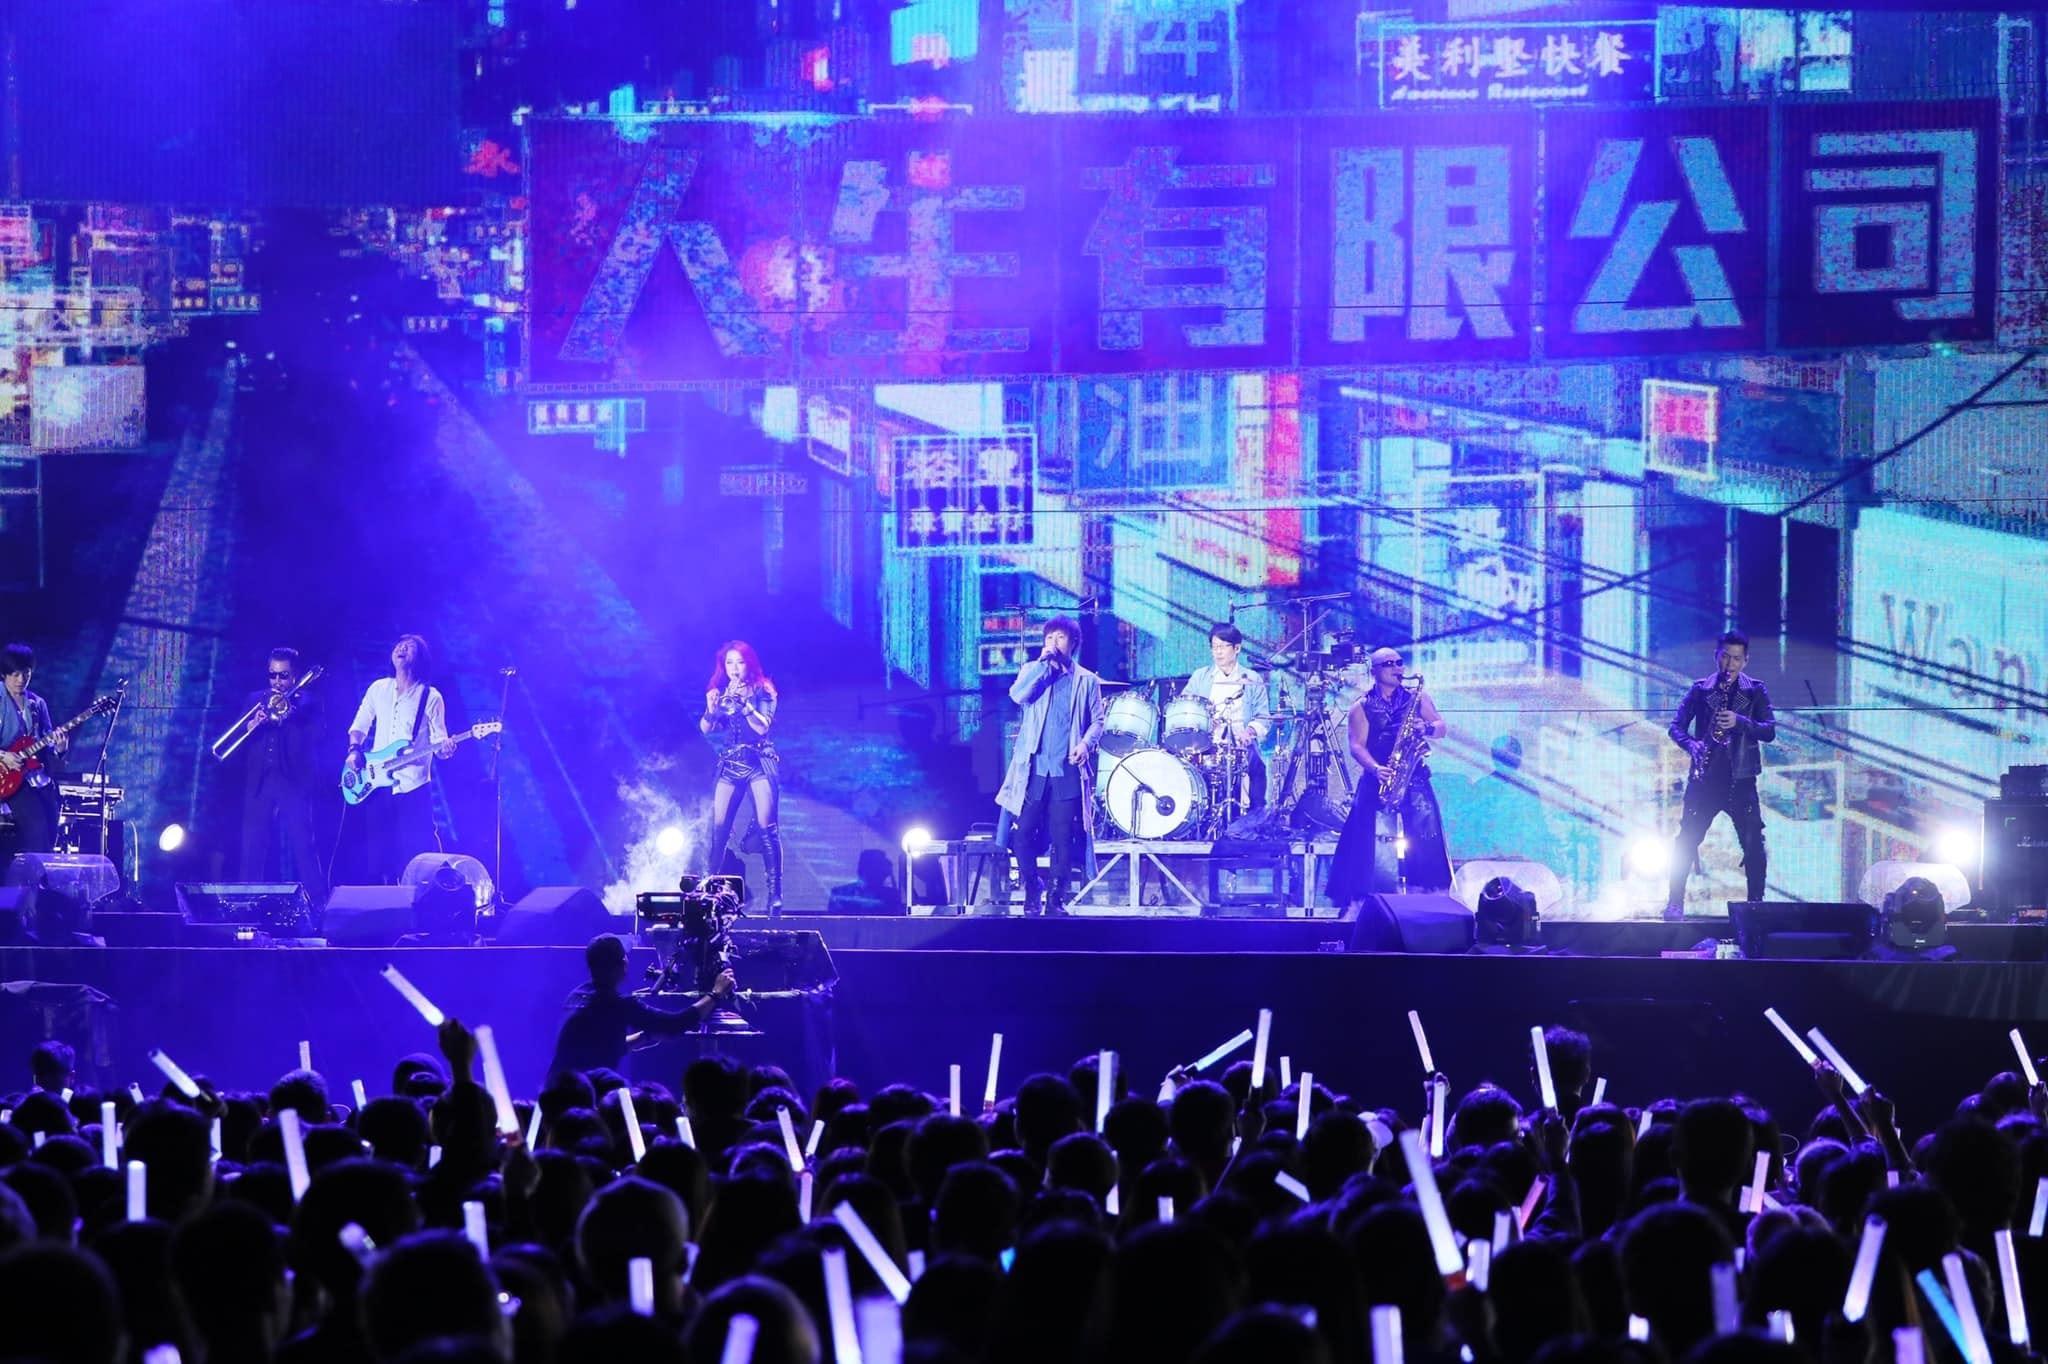 Life Tour, Rock concert, Mayday, Music, , Guitarist, , Concert, B'in Music Co. Ltd, Musician, Life Tour, concert, stage, rock concert, entertainment, crowd, performance, guitarist, auditorium, audience, event